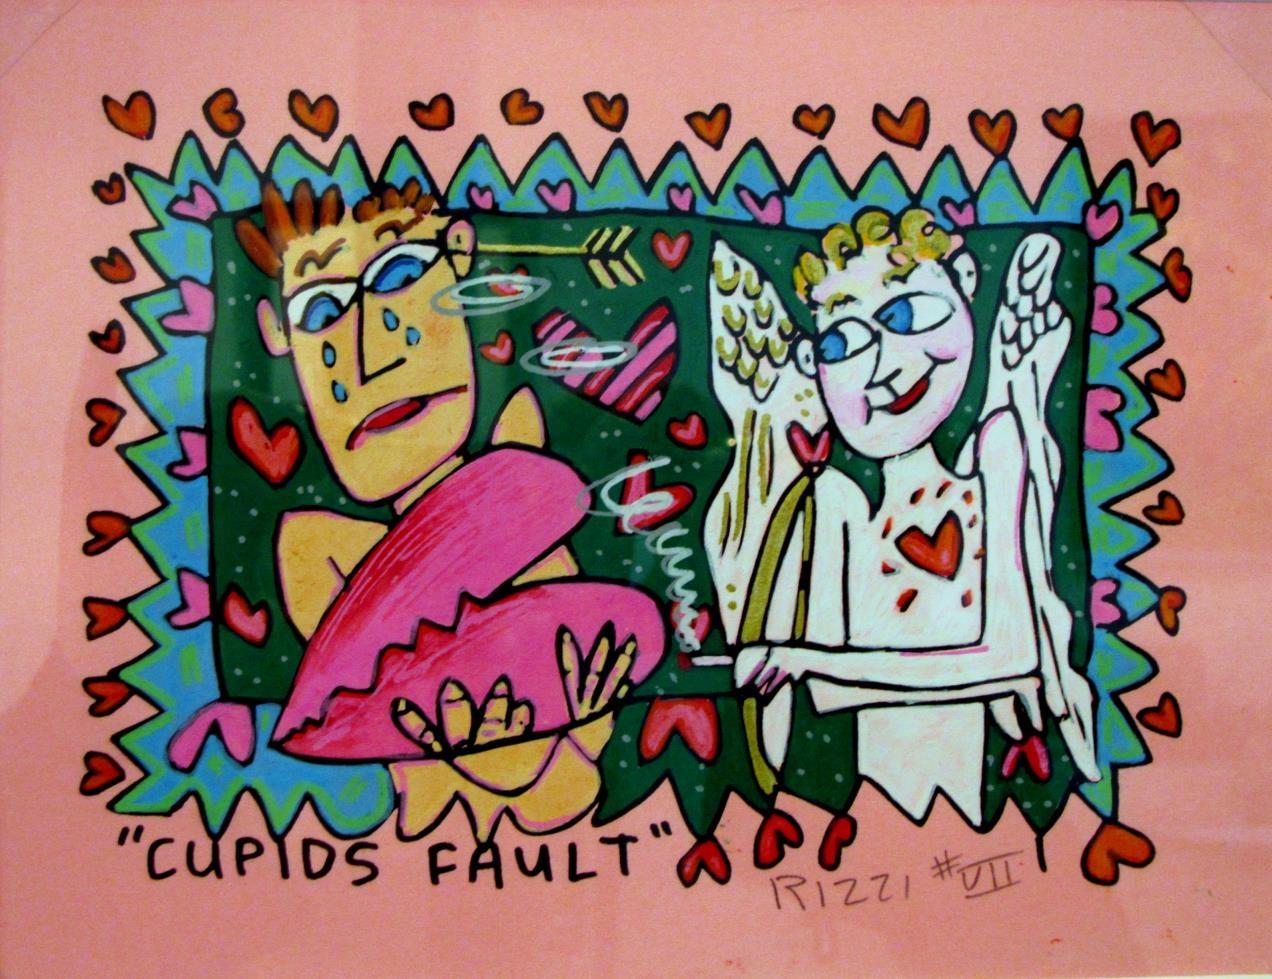 Cupids Fault